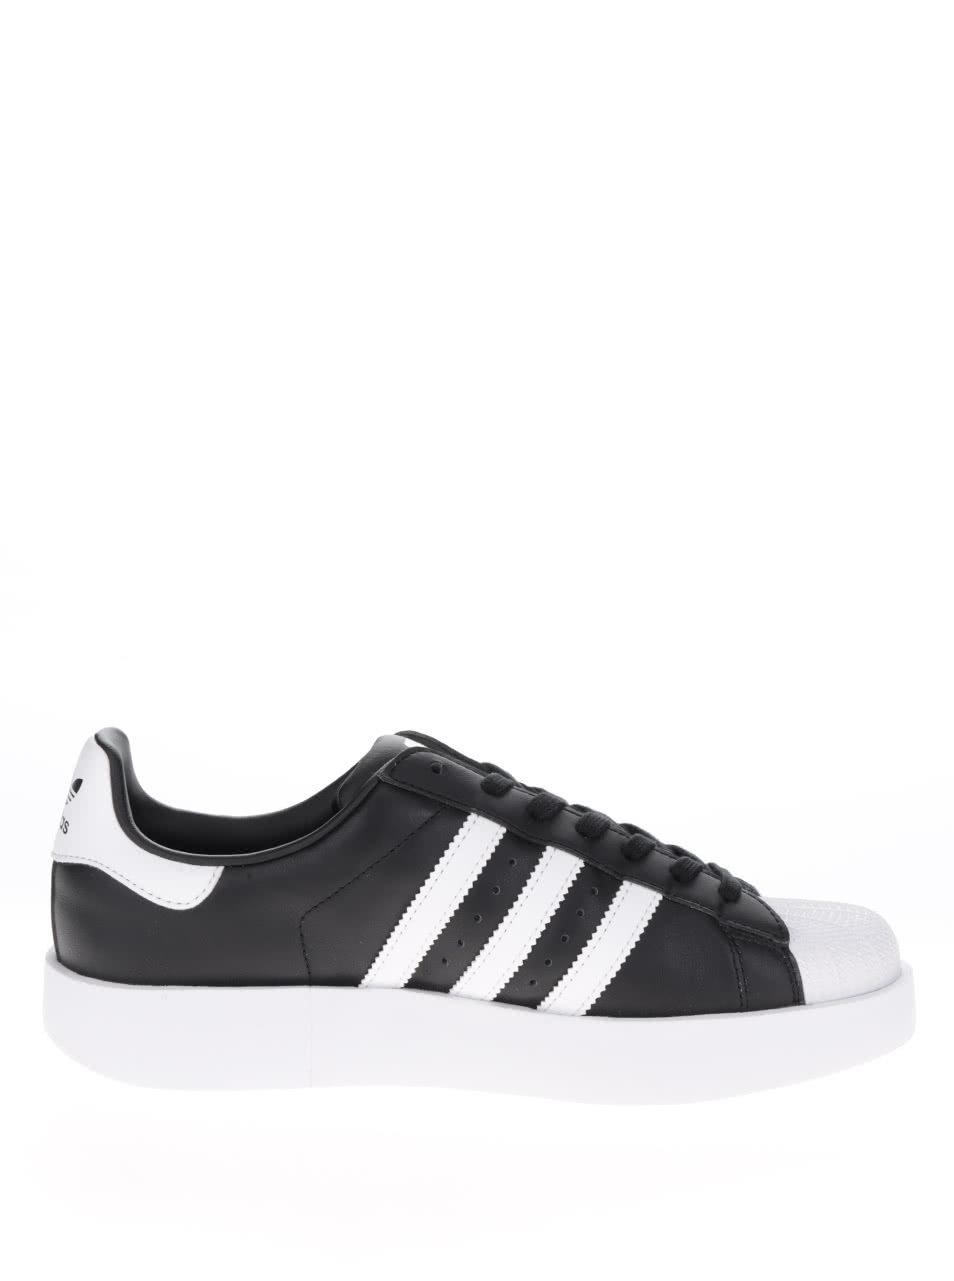 Černé dámské kožené tenisky na platformě adidas Originals Superstar ... 85b279e5bd